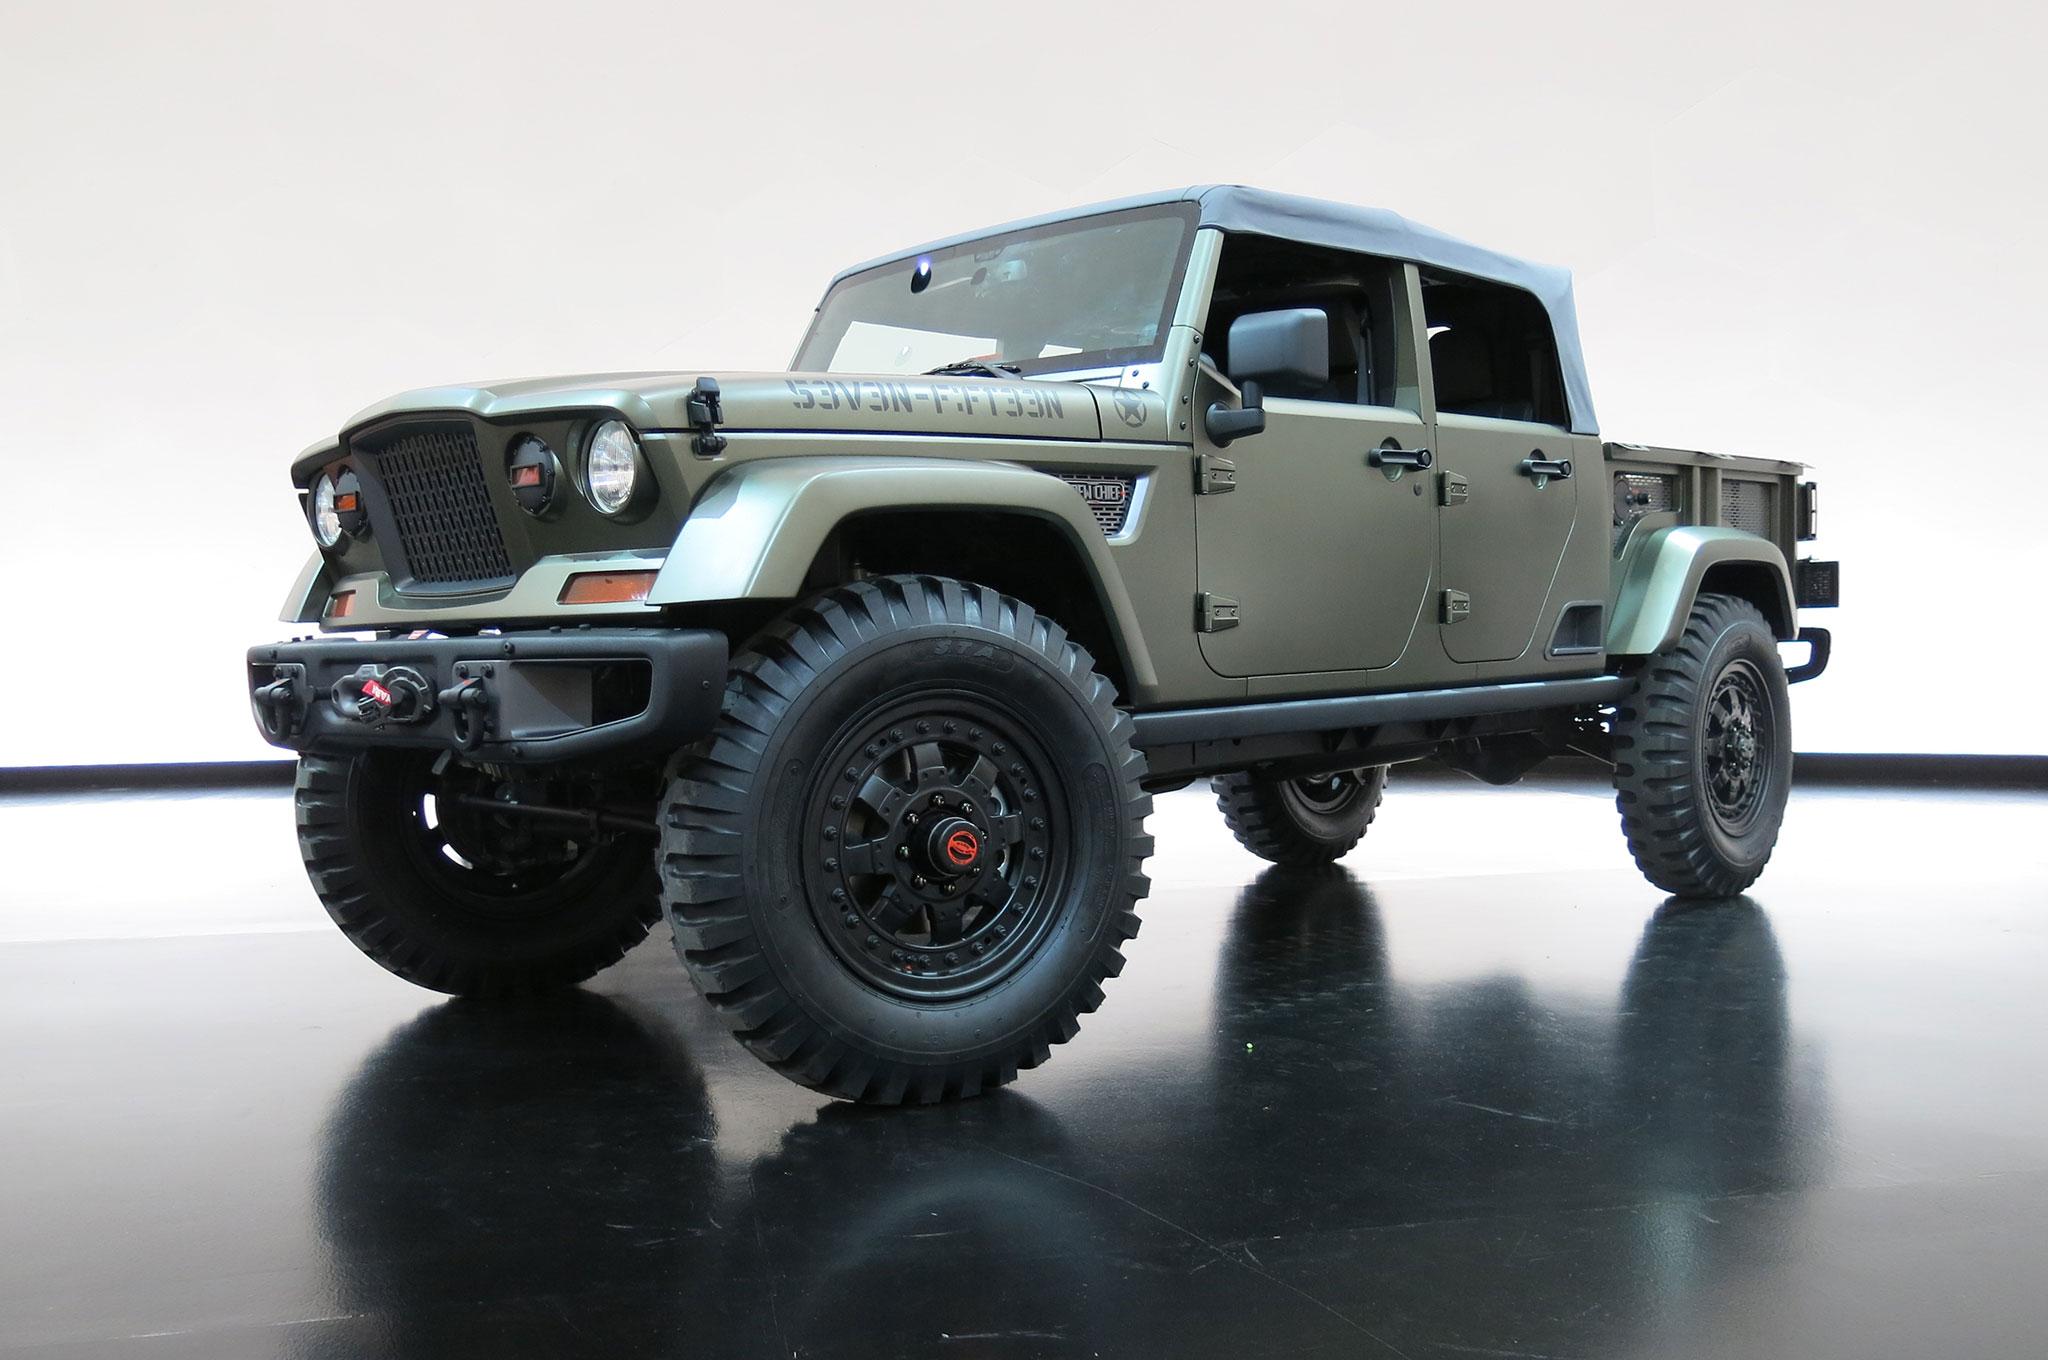 jeep trailcat concept headlines 2016 moab easter safari lineup automobile magazine. Black Bedroom Furniture Sets. Home Design Ideas